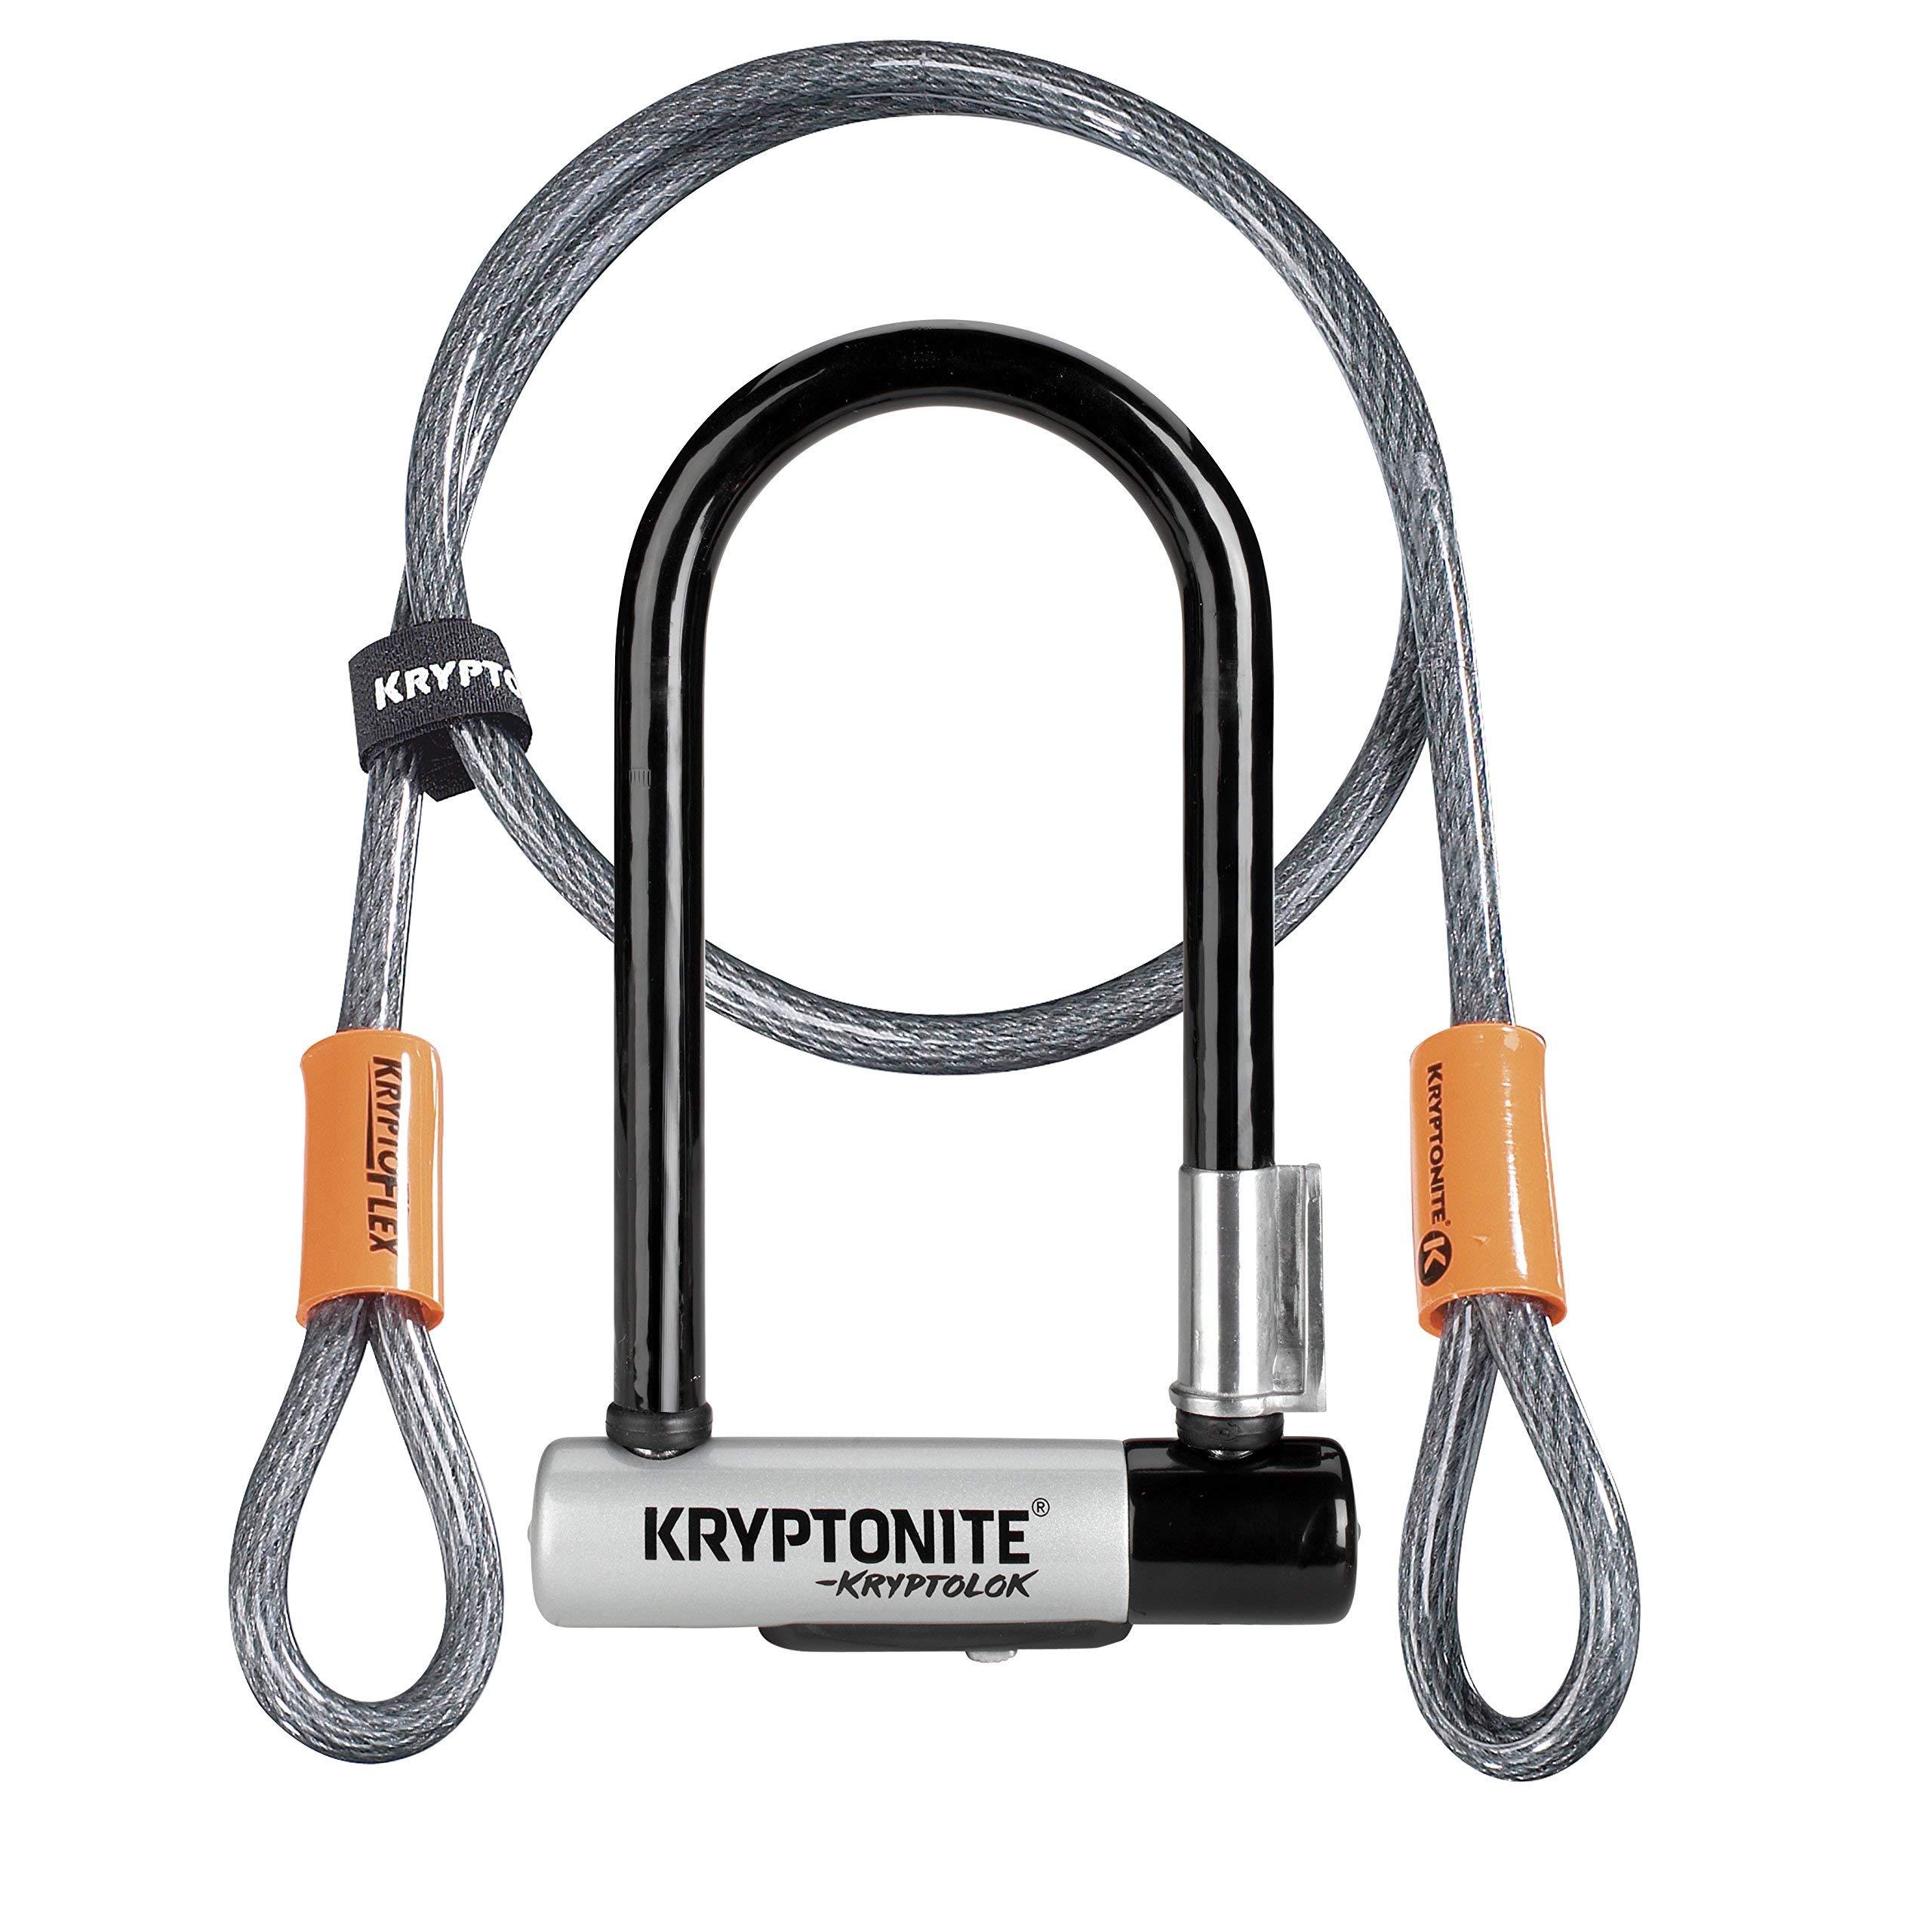 Kryptonite KryptoLok Mini-7 mit KFlex 120cm Fahrradschloss, Silver, 120 cm